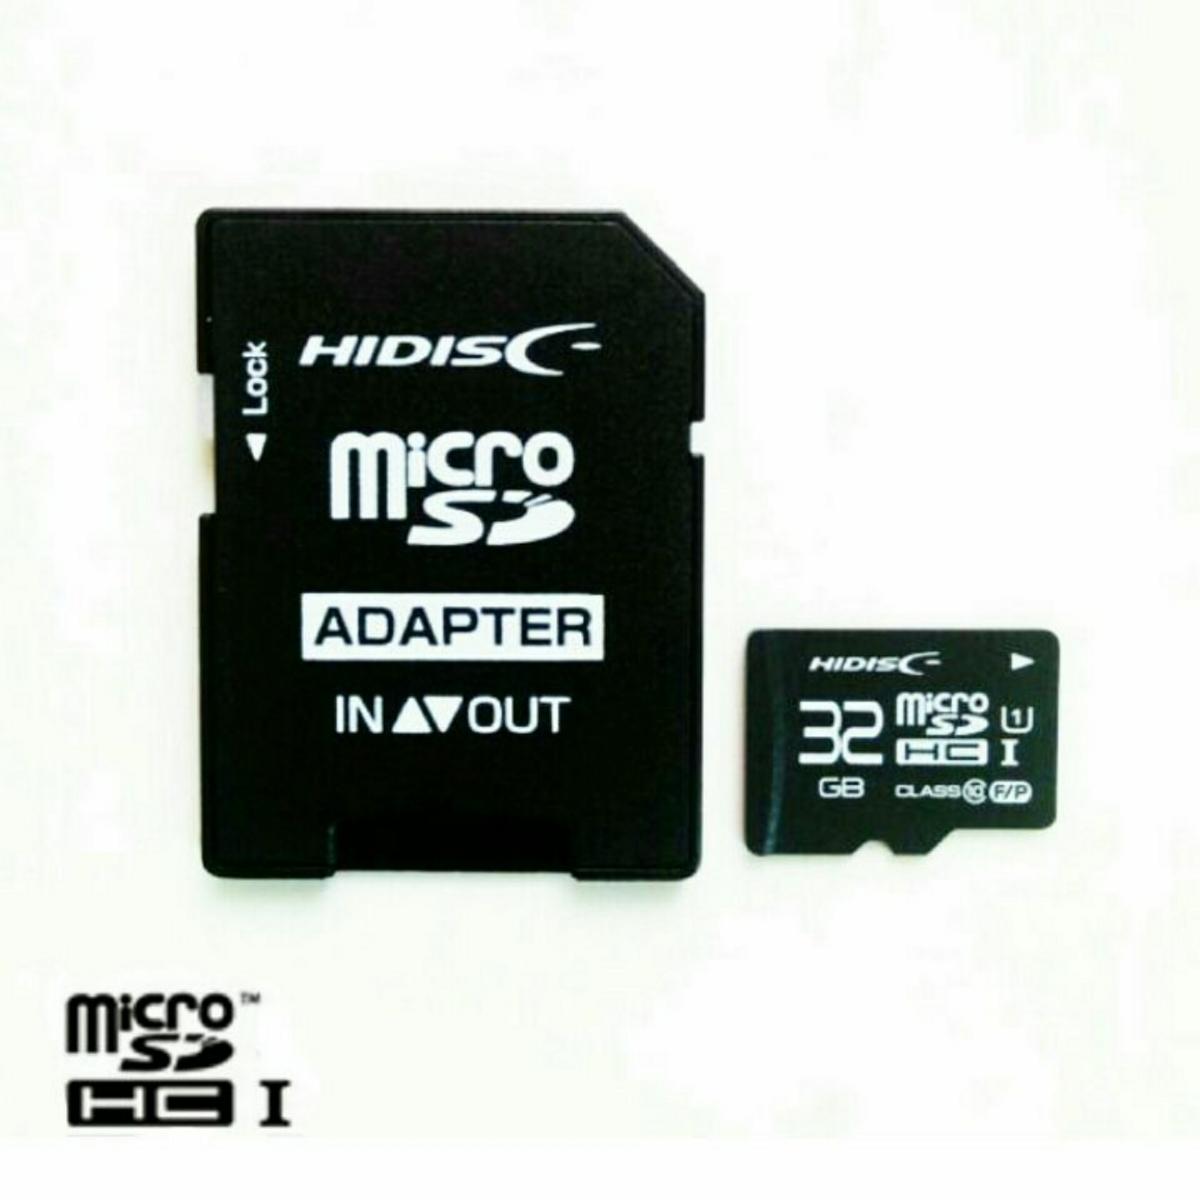 microSDHC32GBメモリーカード(HI-DISC)HDMCSDH32GCL10UIJP3【1円スタート出品・新品・送料無料】_画像2